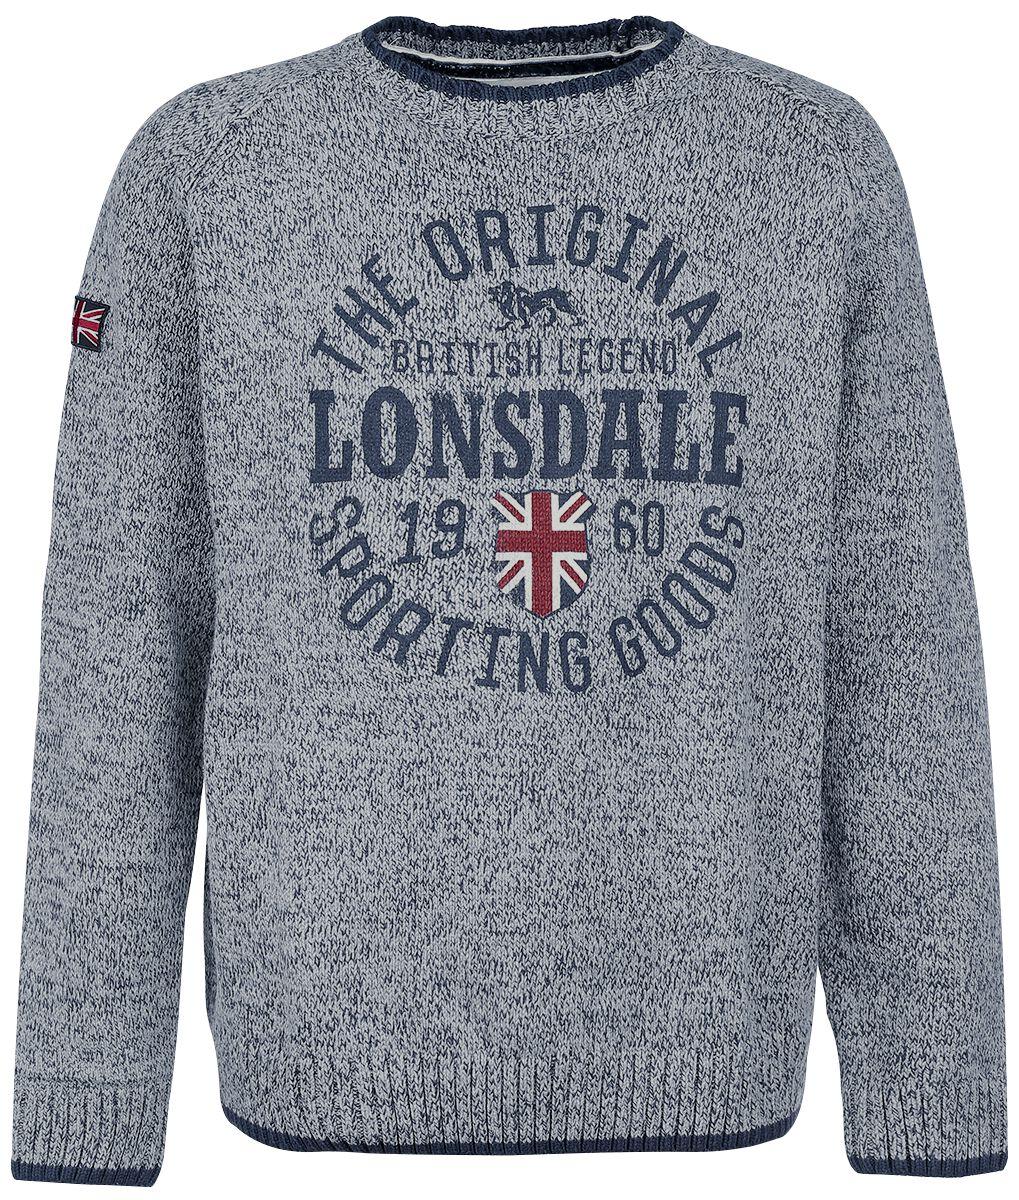 Marki - Bluzy - Bluza Lonsdale London Borden Bluza szary - 298255